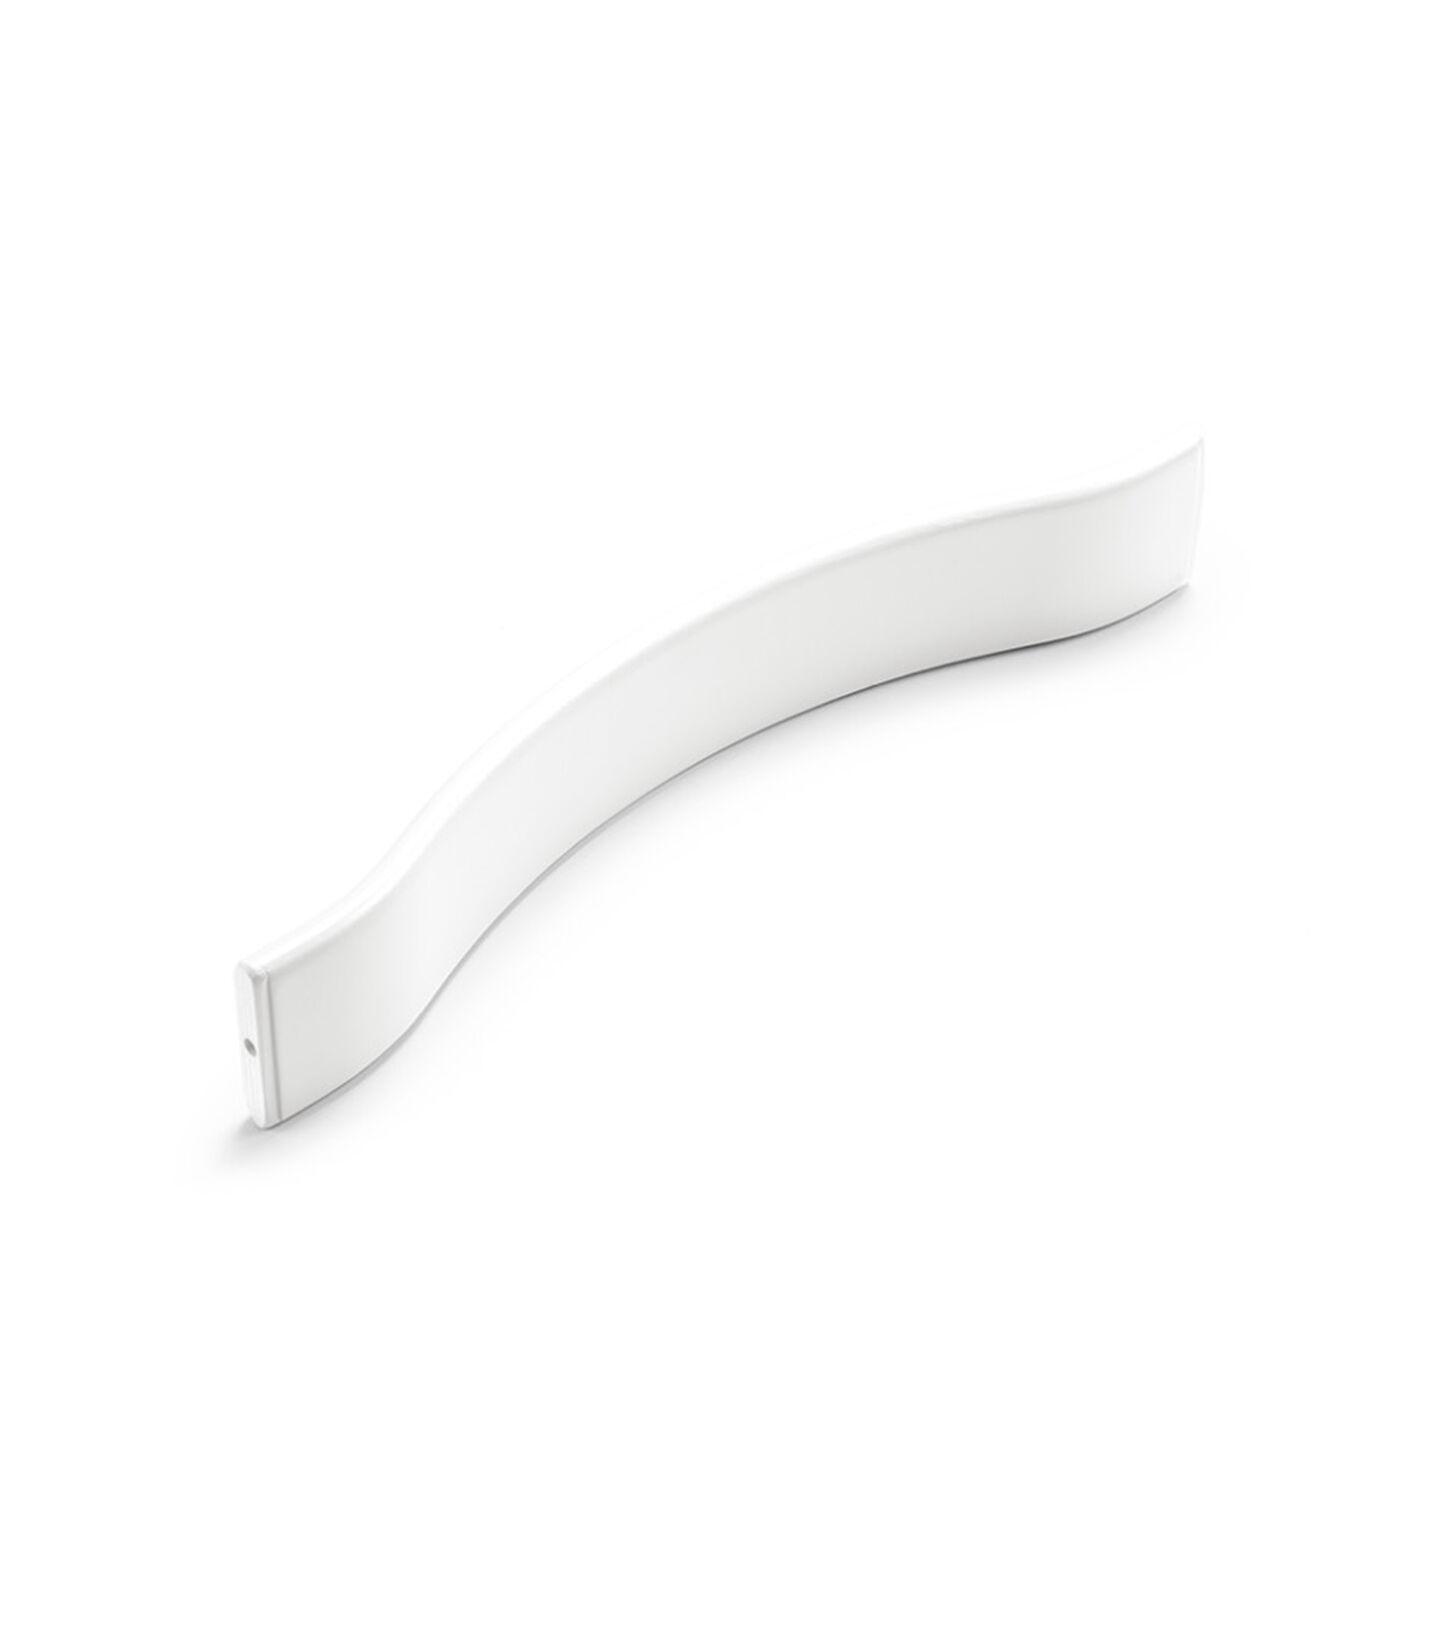 Tripp Trapp® Backlaminate White, White, mainview view 2